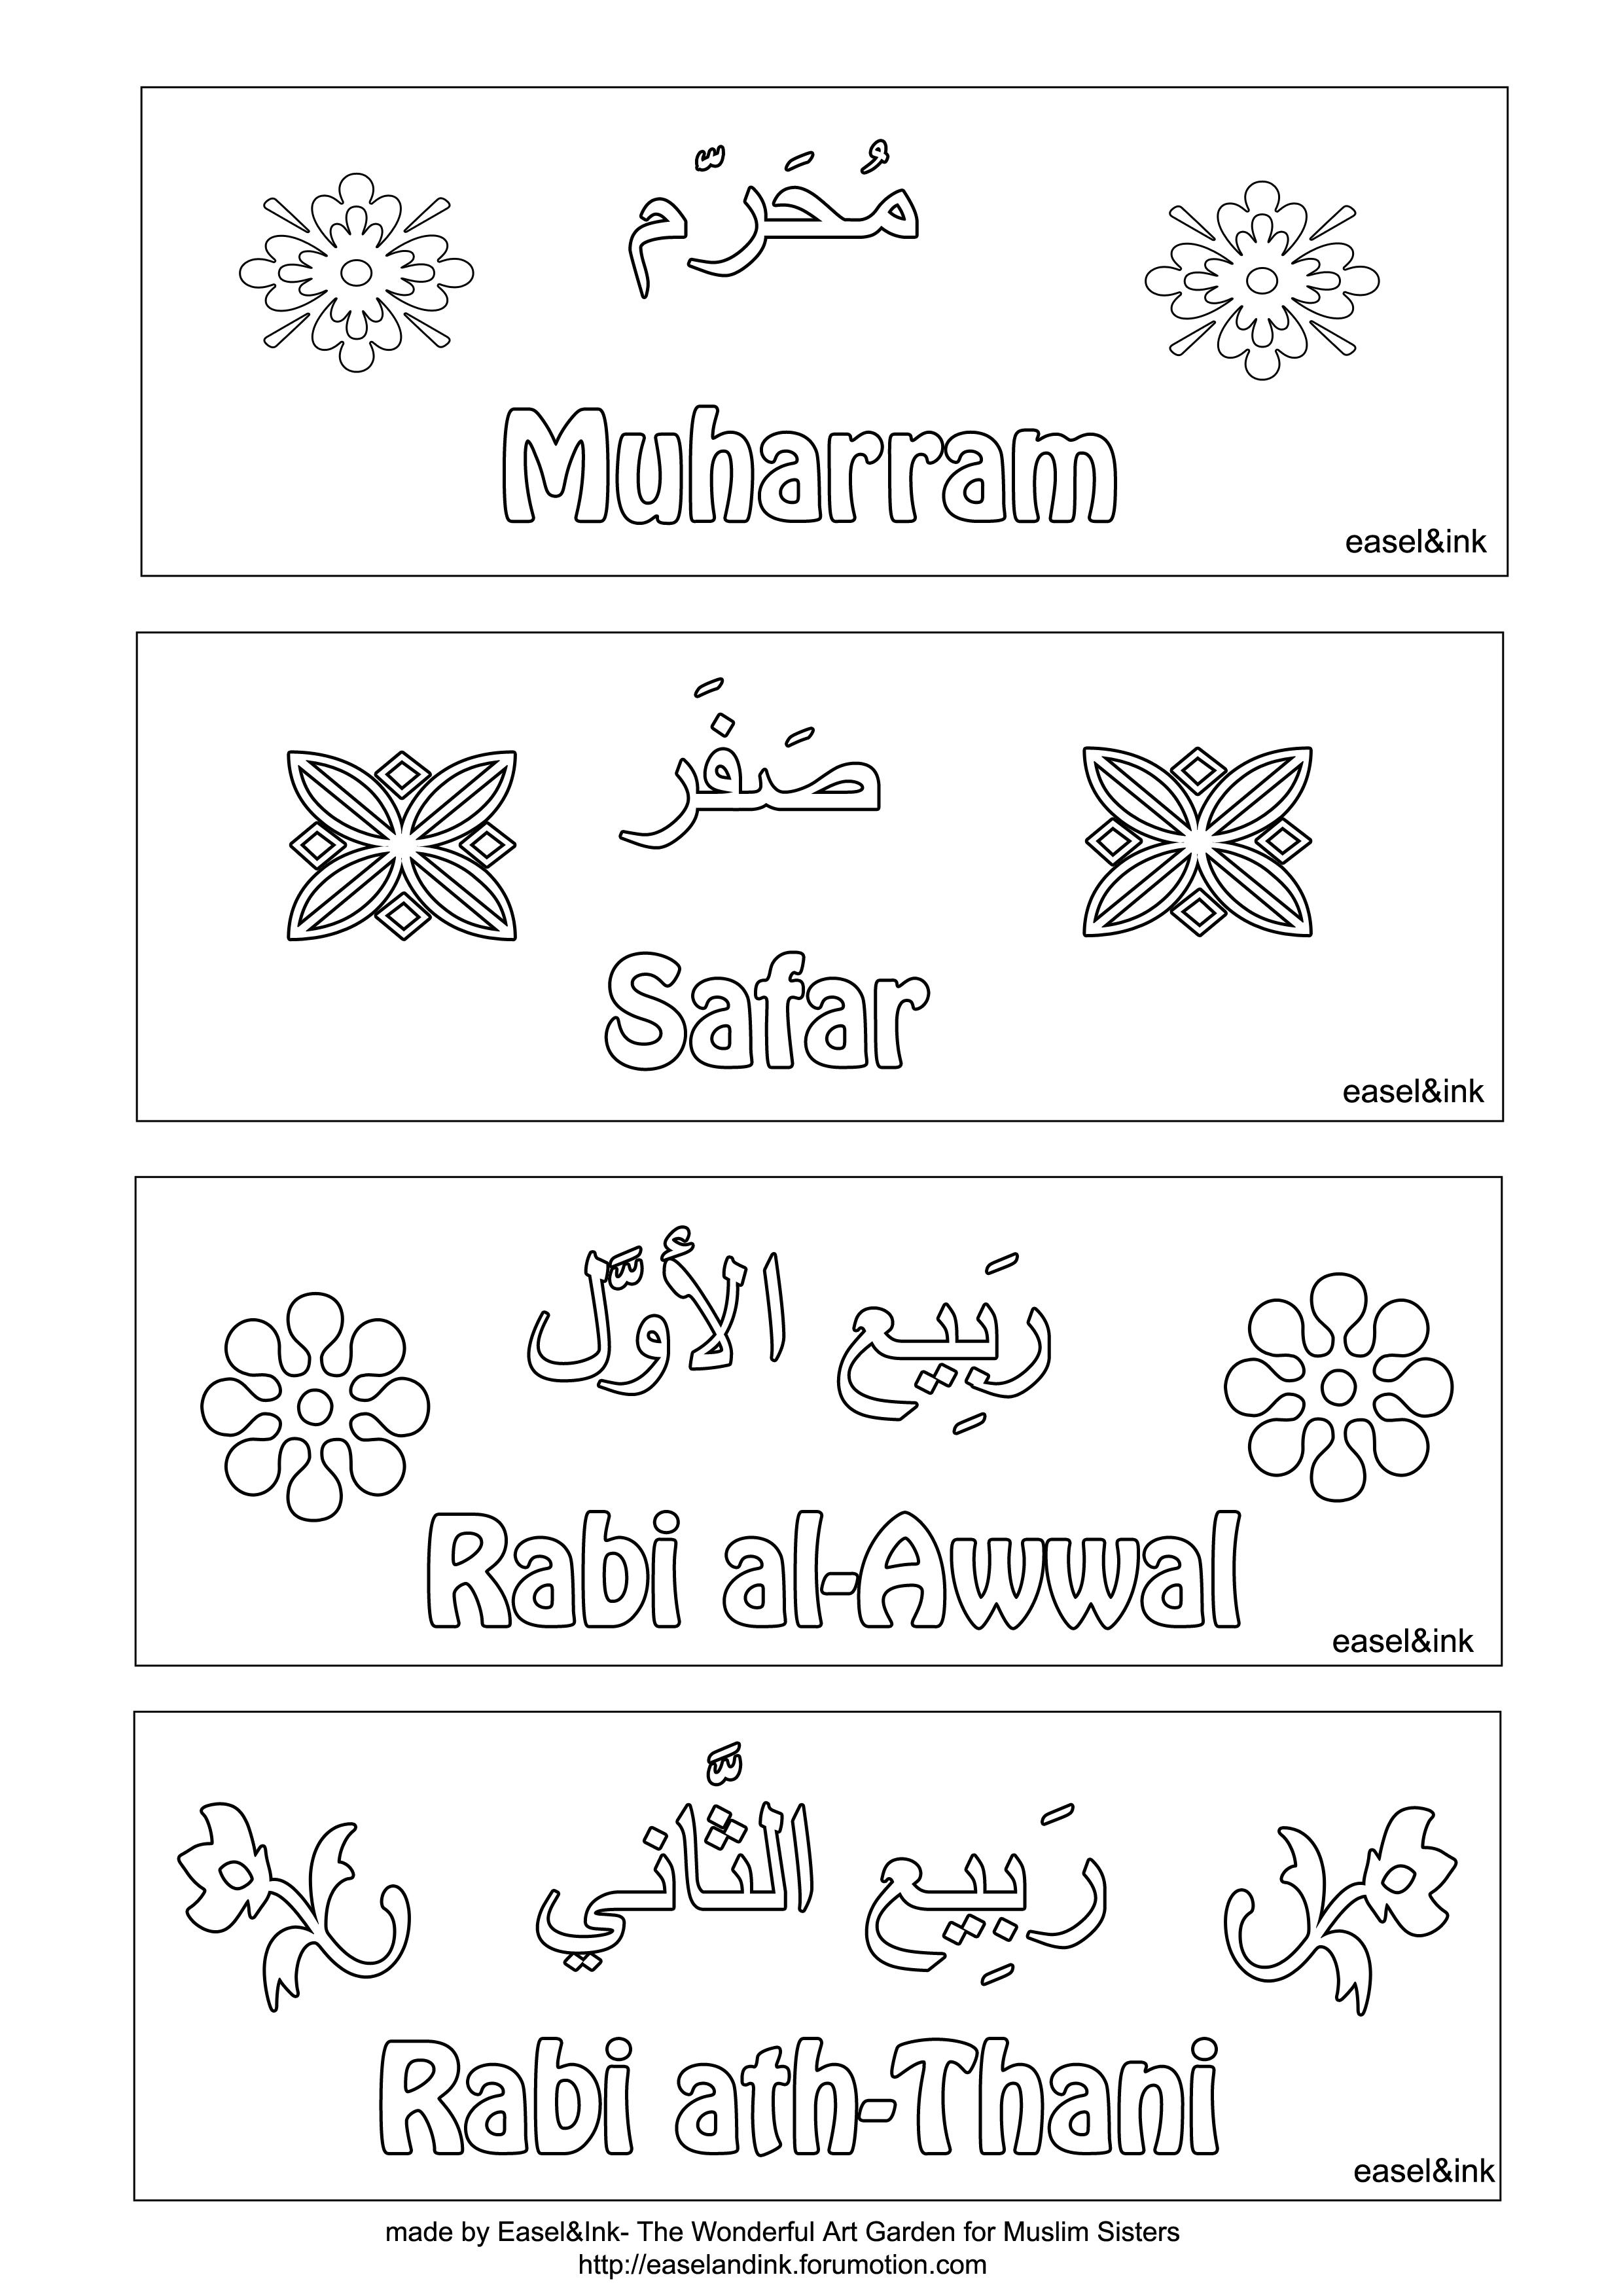 Islamic Months In English And Arabic 1 Muharram 2